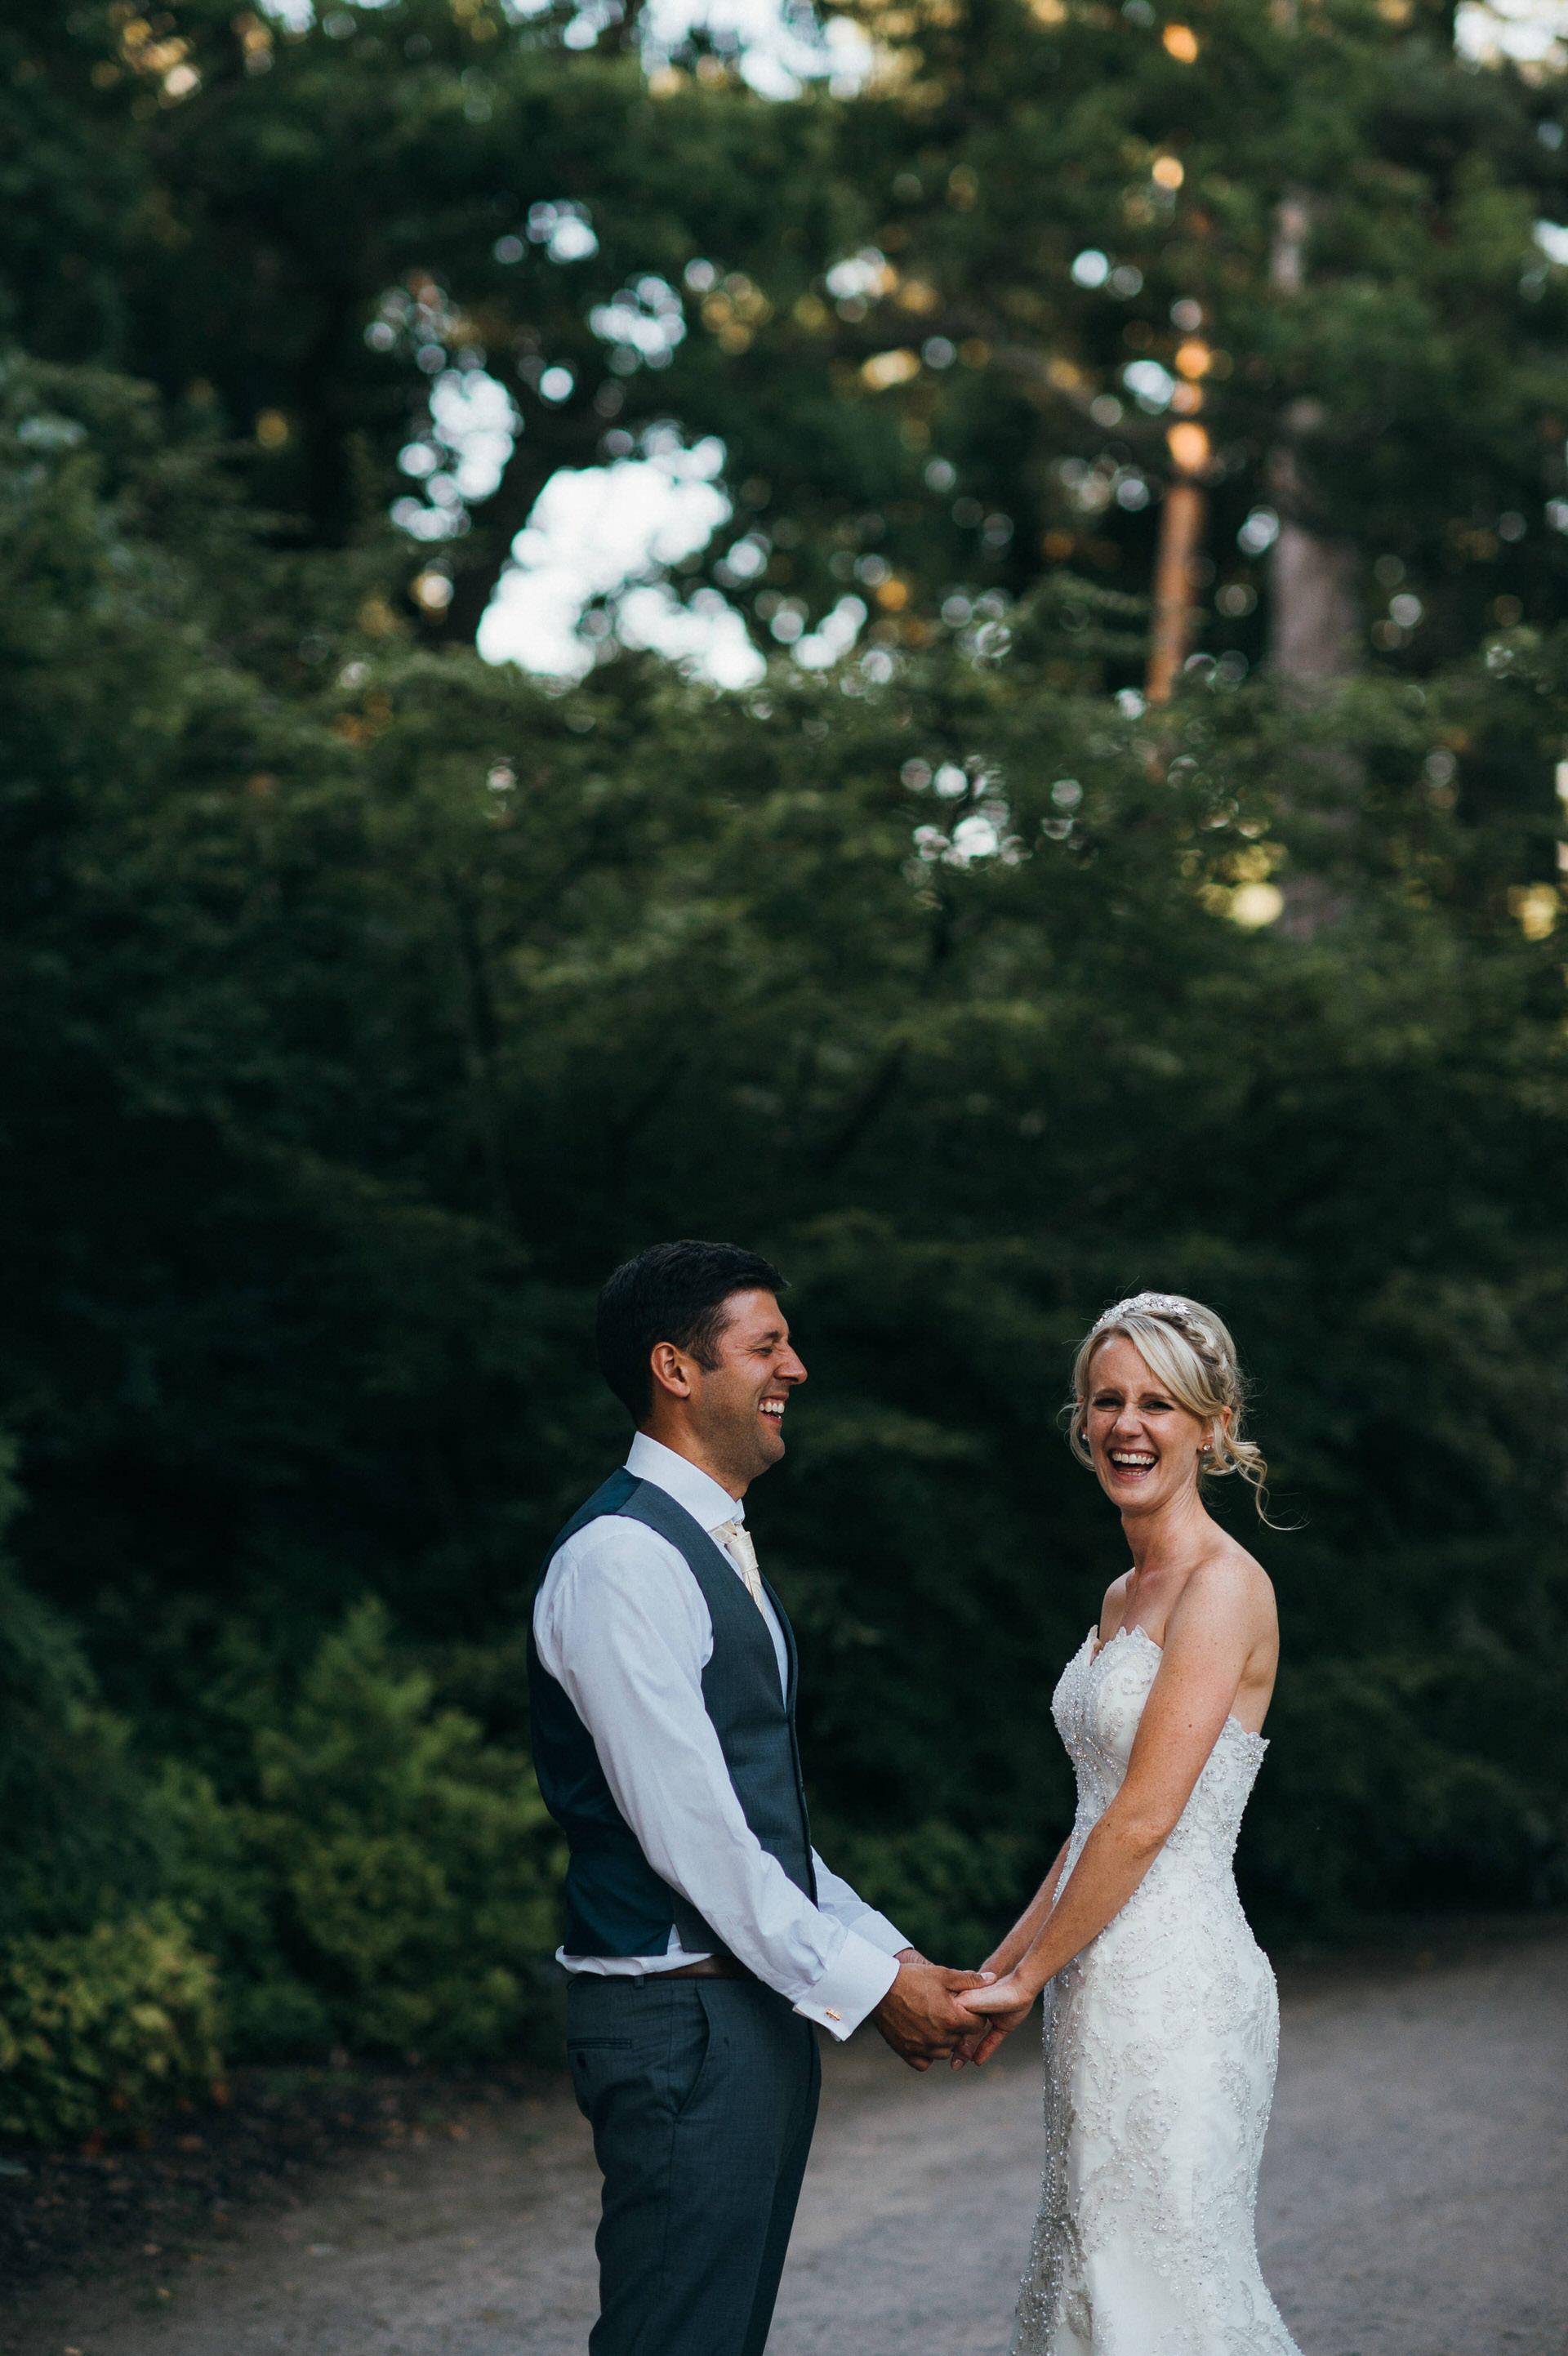 Bride and Groom wedding RSH Wisely